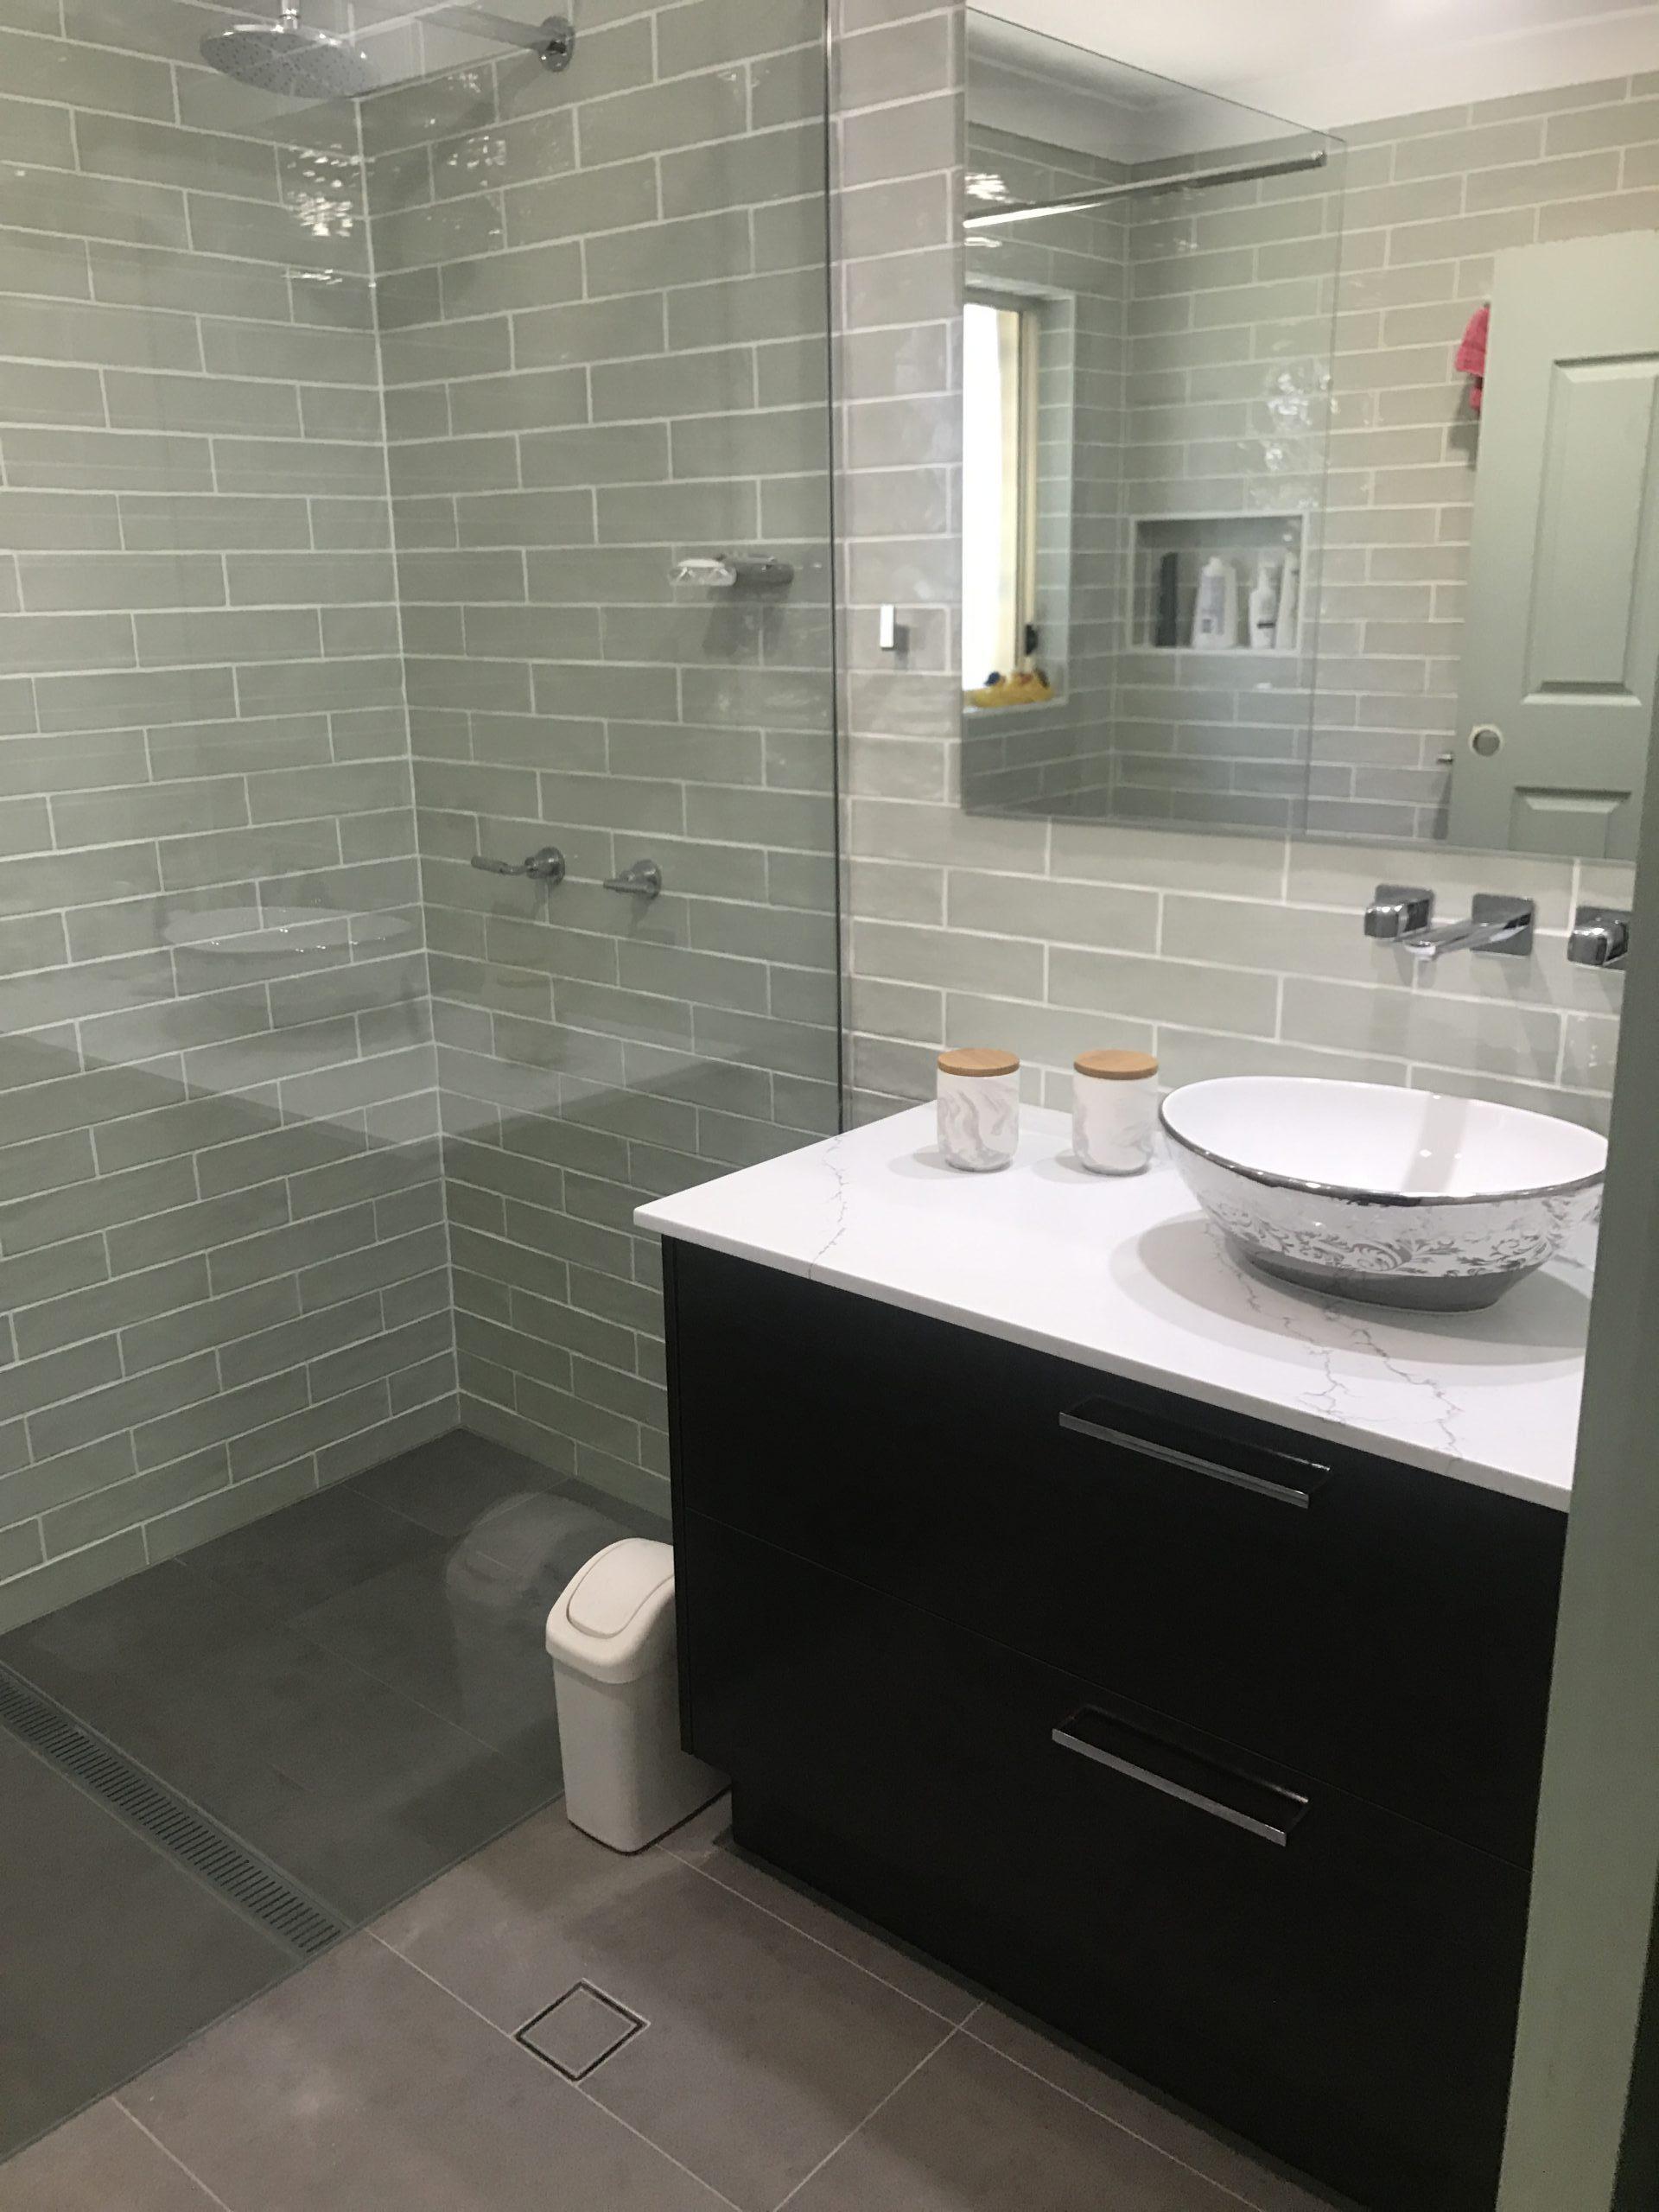 Troy Roberts - bathrooms image